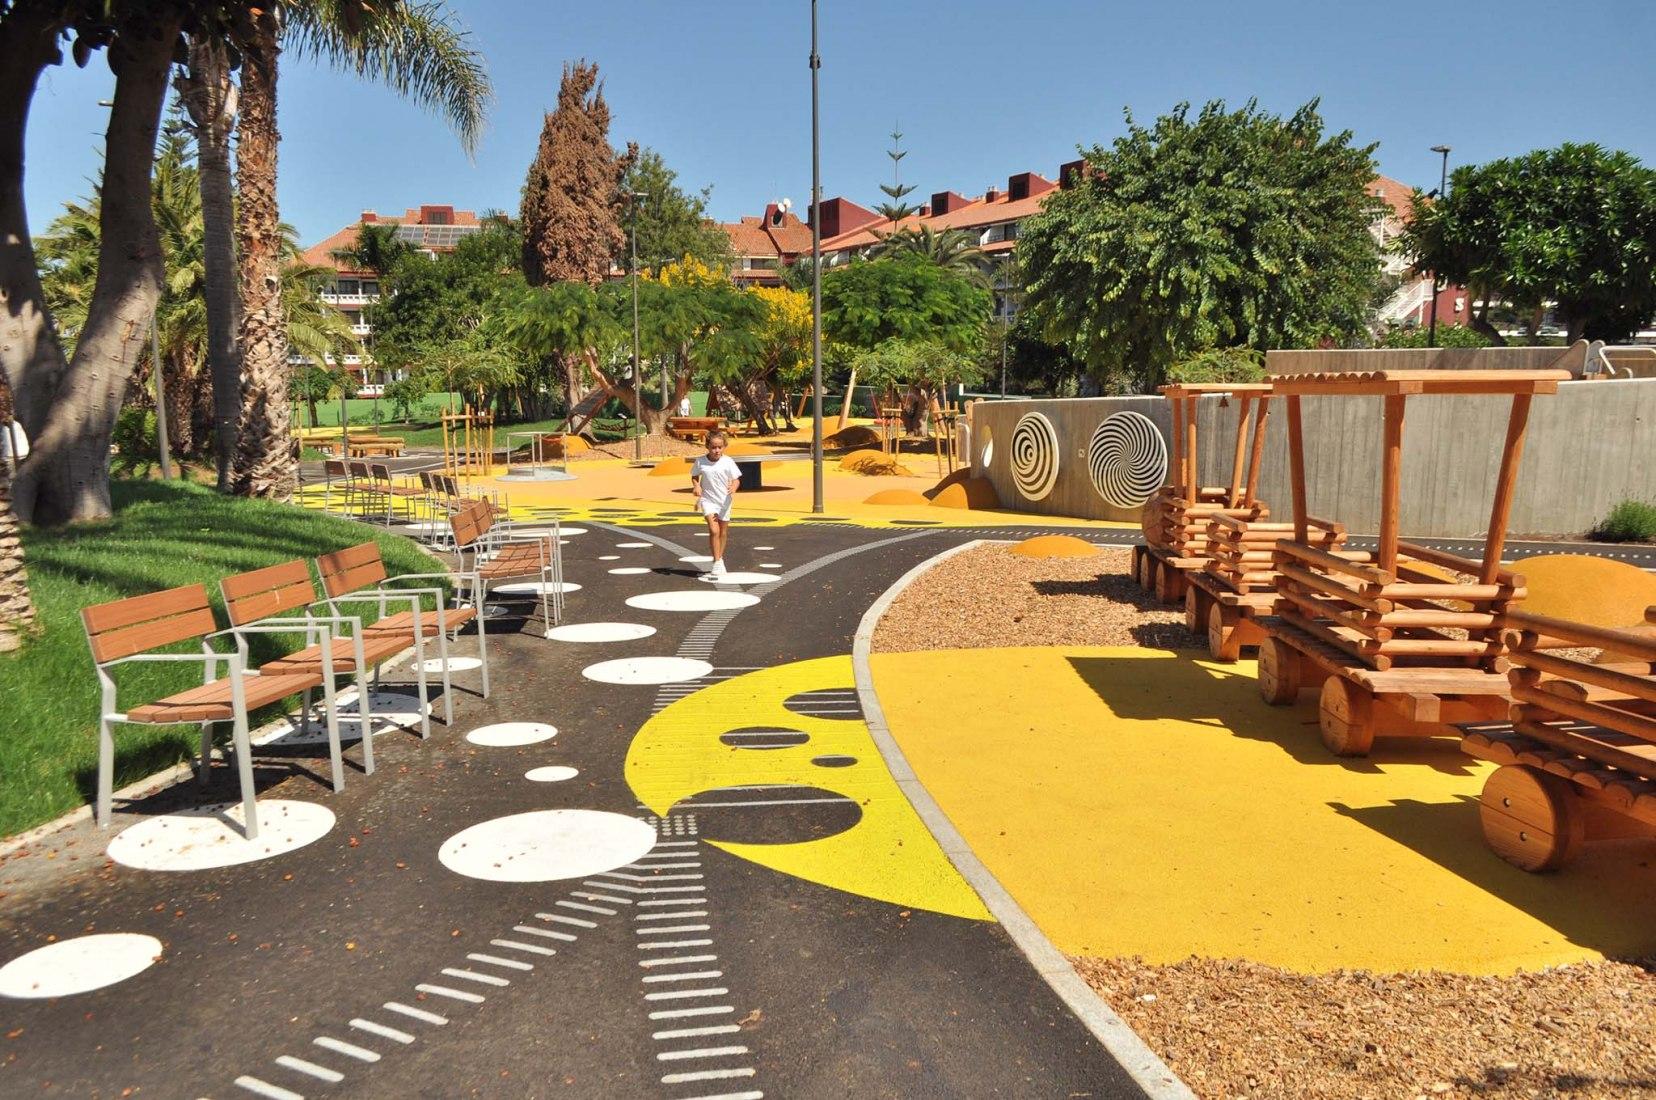 Inclusive Park, El Laurel by Jiménez Bazán Arquitectos. Photograph by Roberto Bazán López